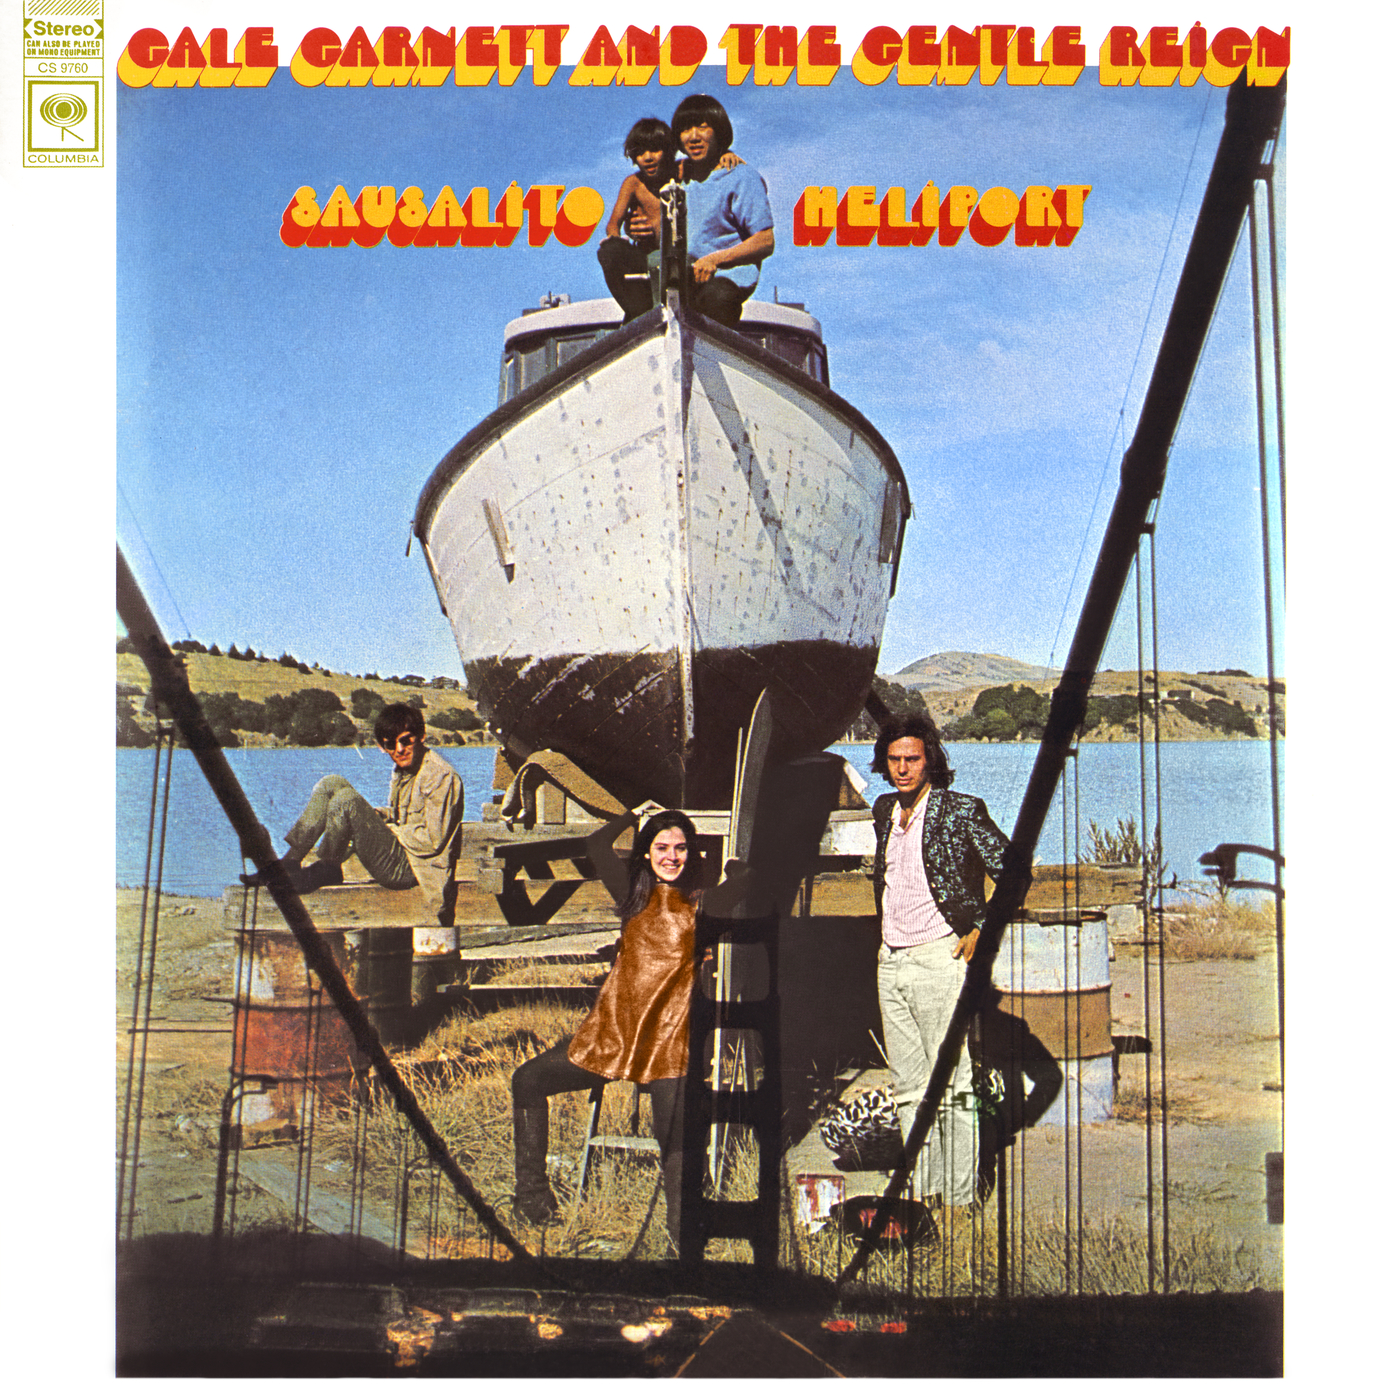 Sausalito Heliport - Gale Garnett